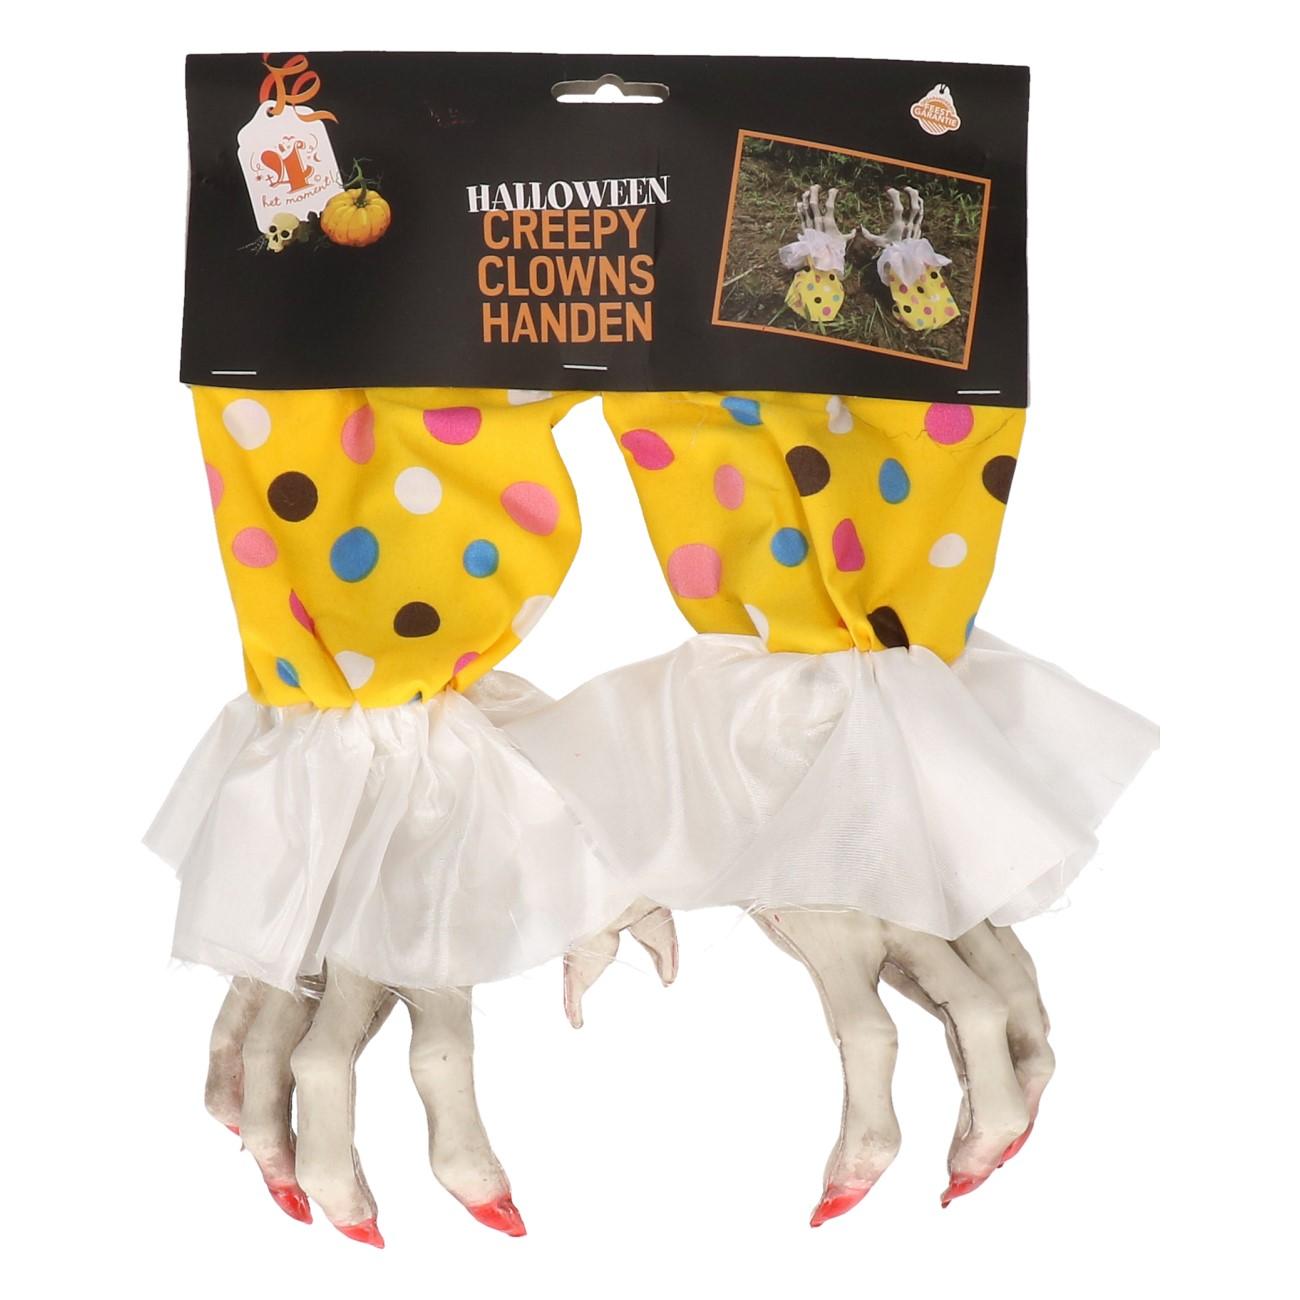 Creepy clownshanden